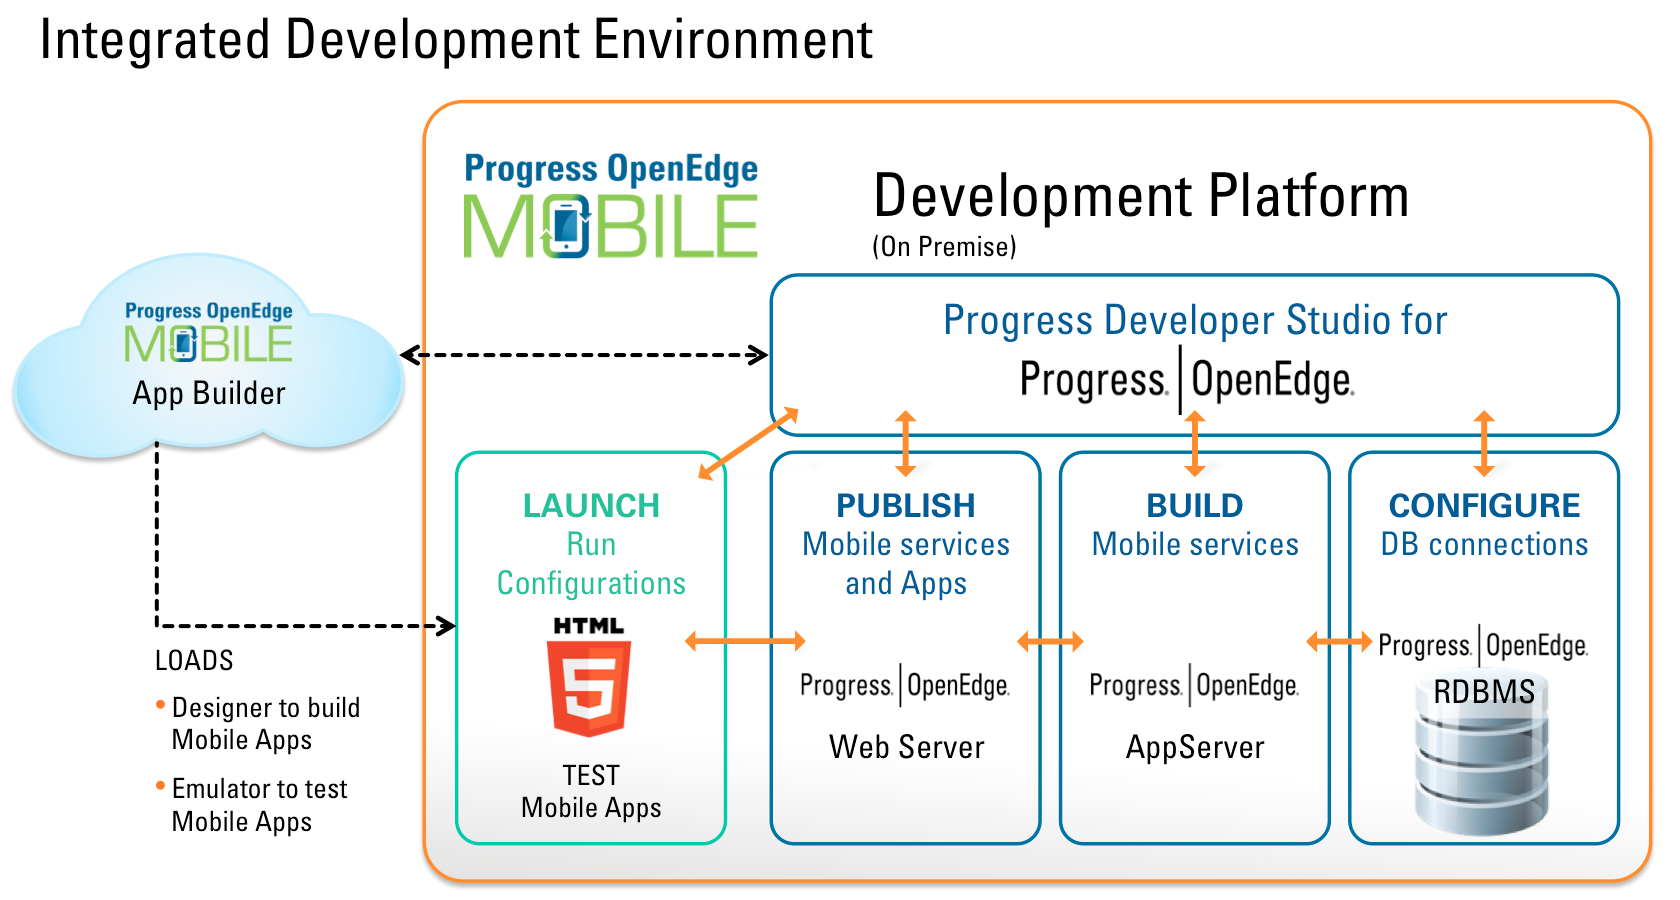 Architecture of mobile software applications - Openedge Mobile Architecture Schematic